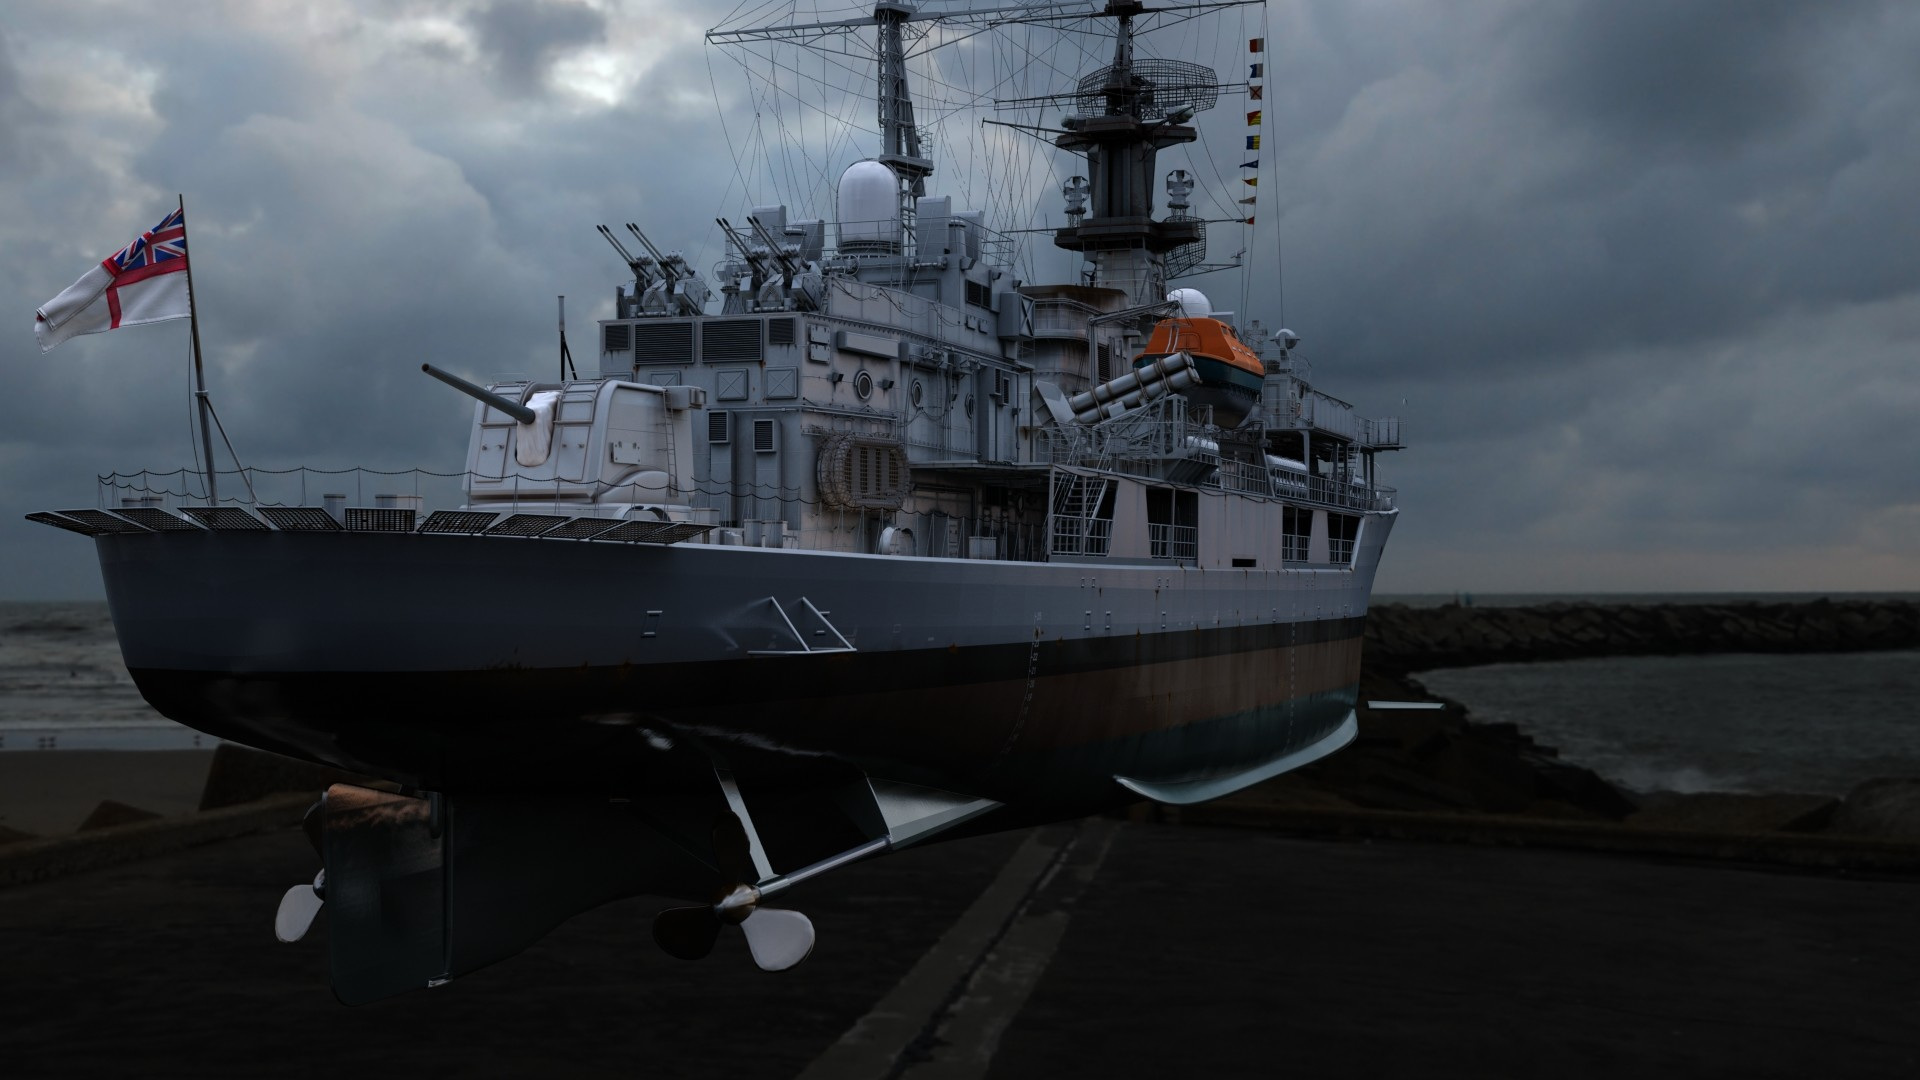 HMS Havok 02 (3ds Max)